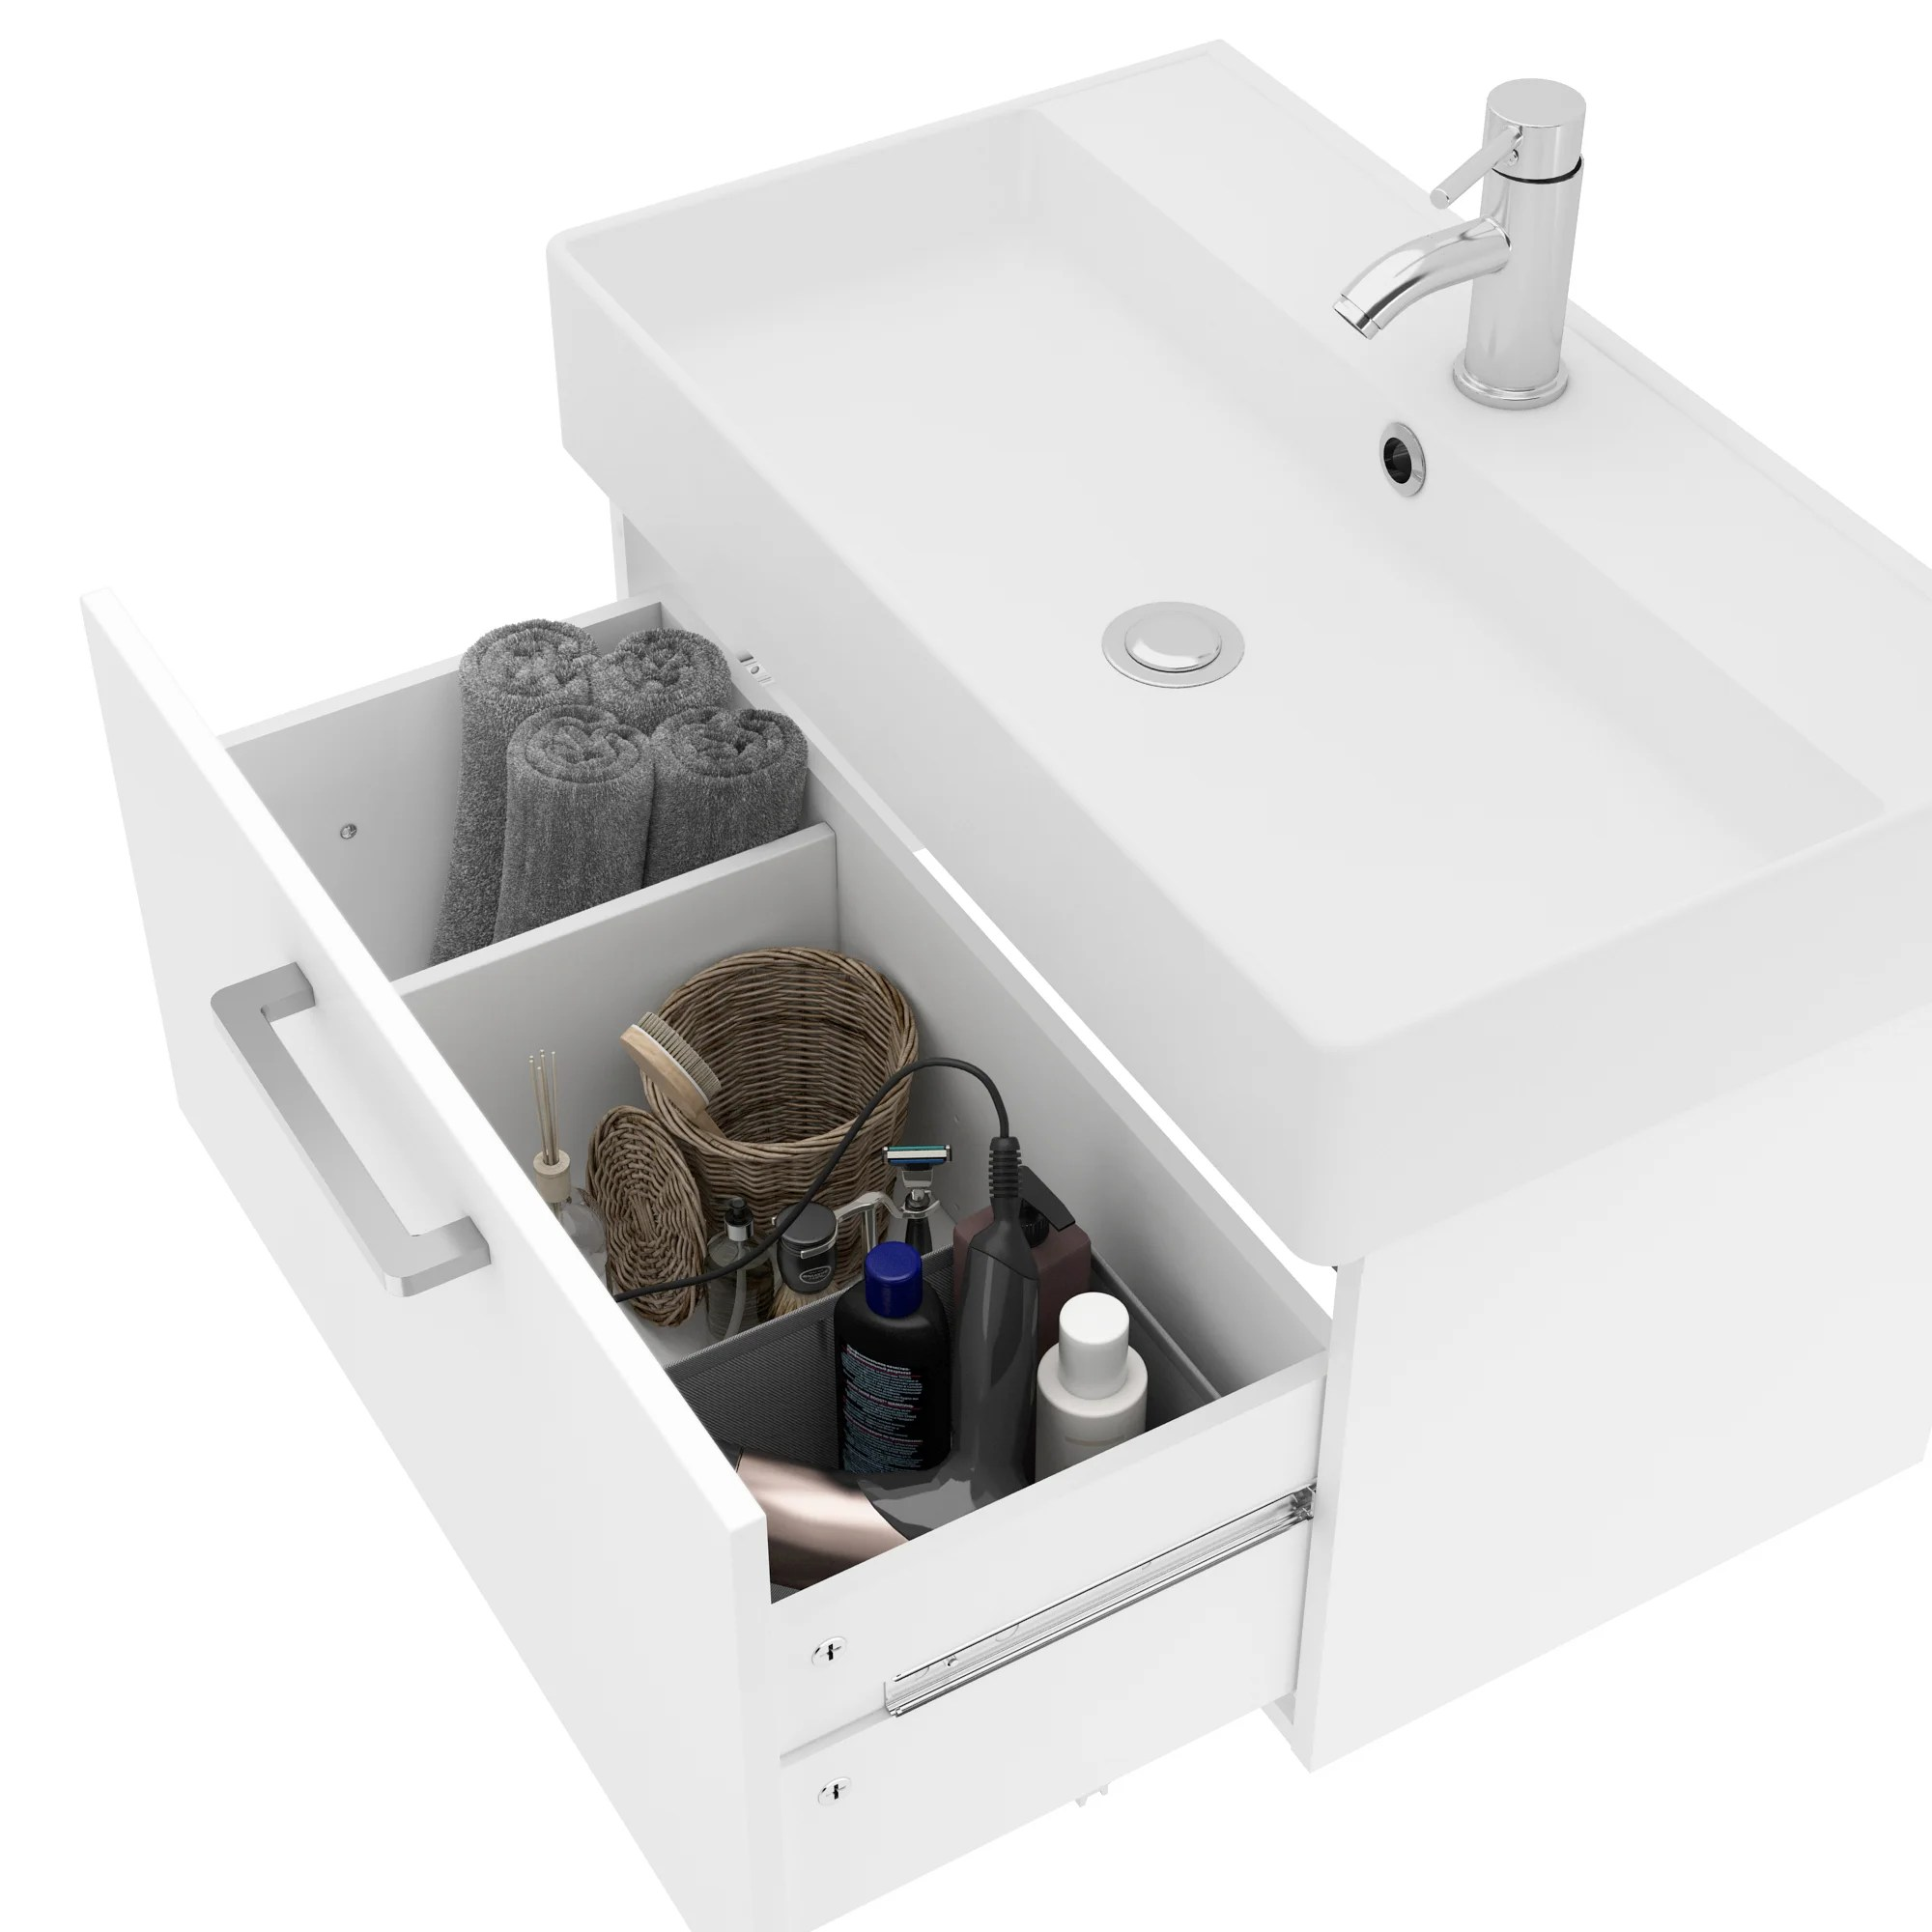 Meuble Simple Vasque Encastree L 70 X H 37 X P 40 Cm Blanc Easy Leroy Merlin